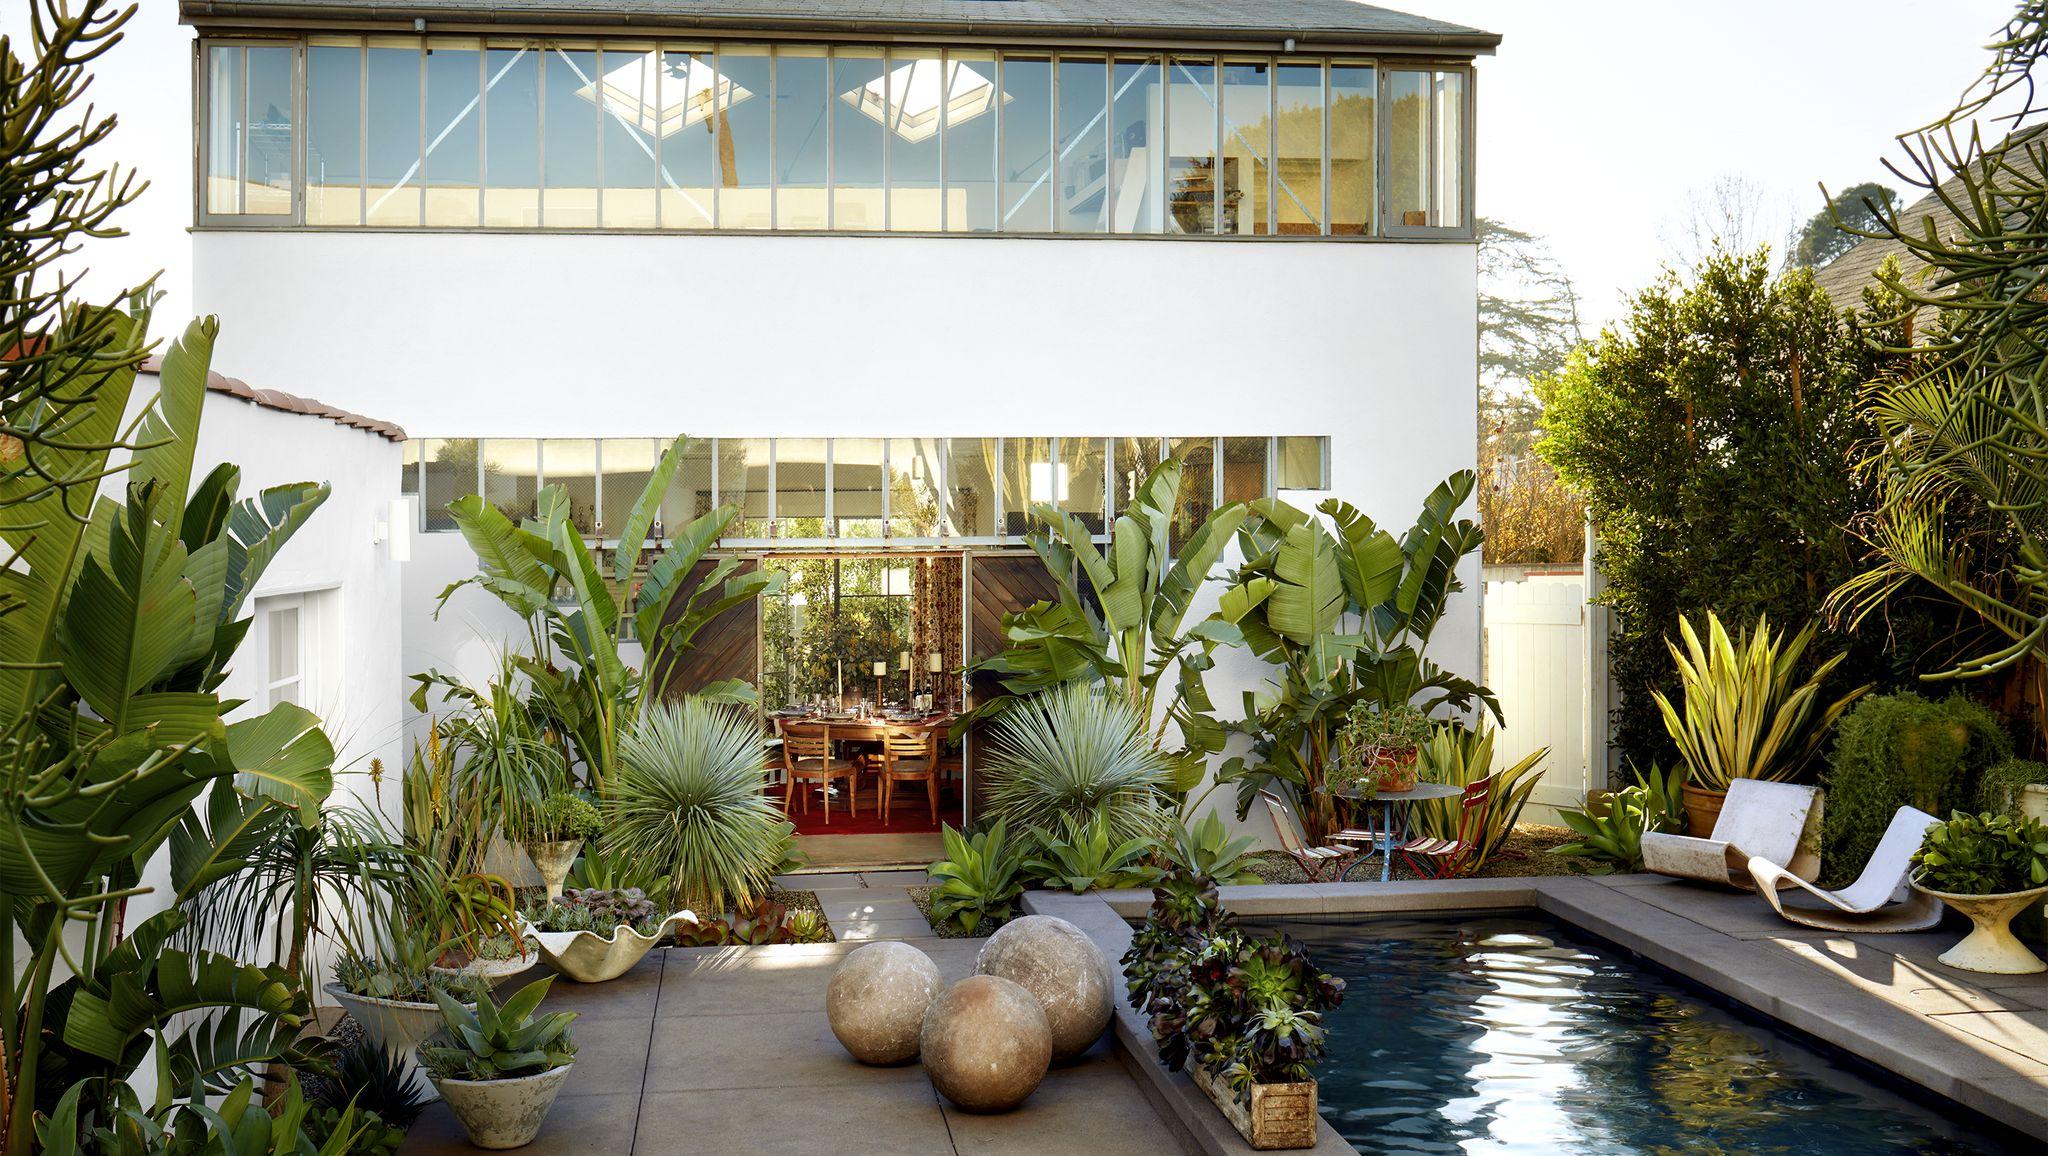 Tour Kathryn M. Ireland's Santa Monica Home That's Big On Bohemian Decor